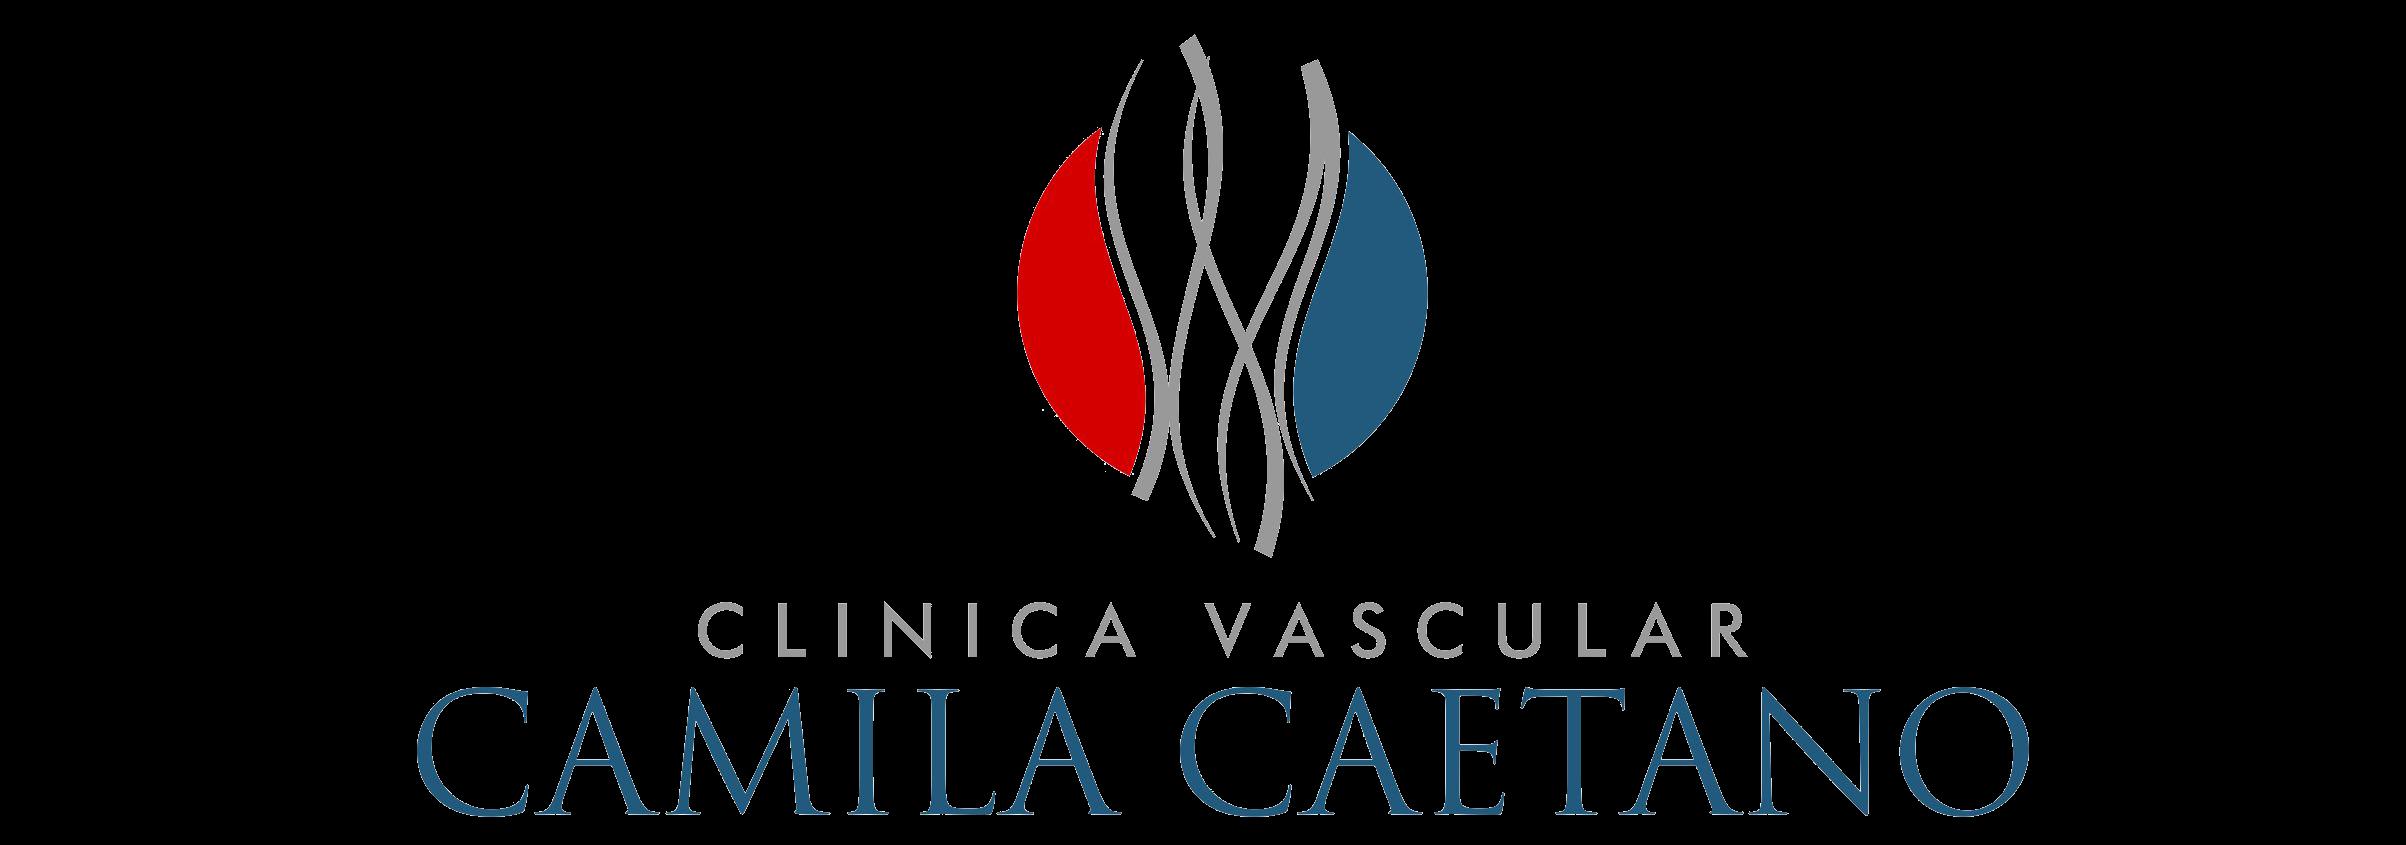 cropped-logotipo-camila-ribeiro-1.png